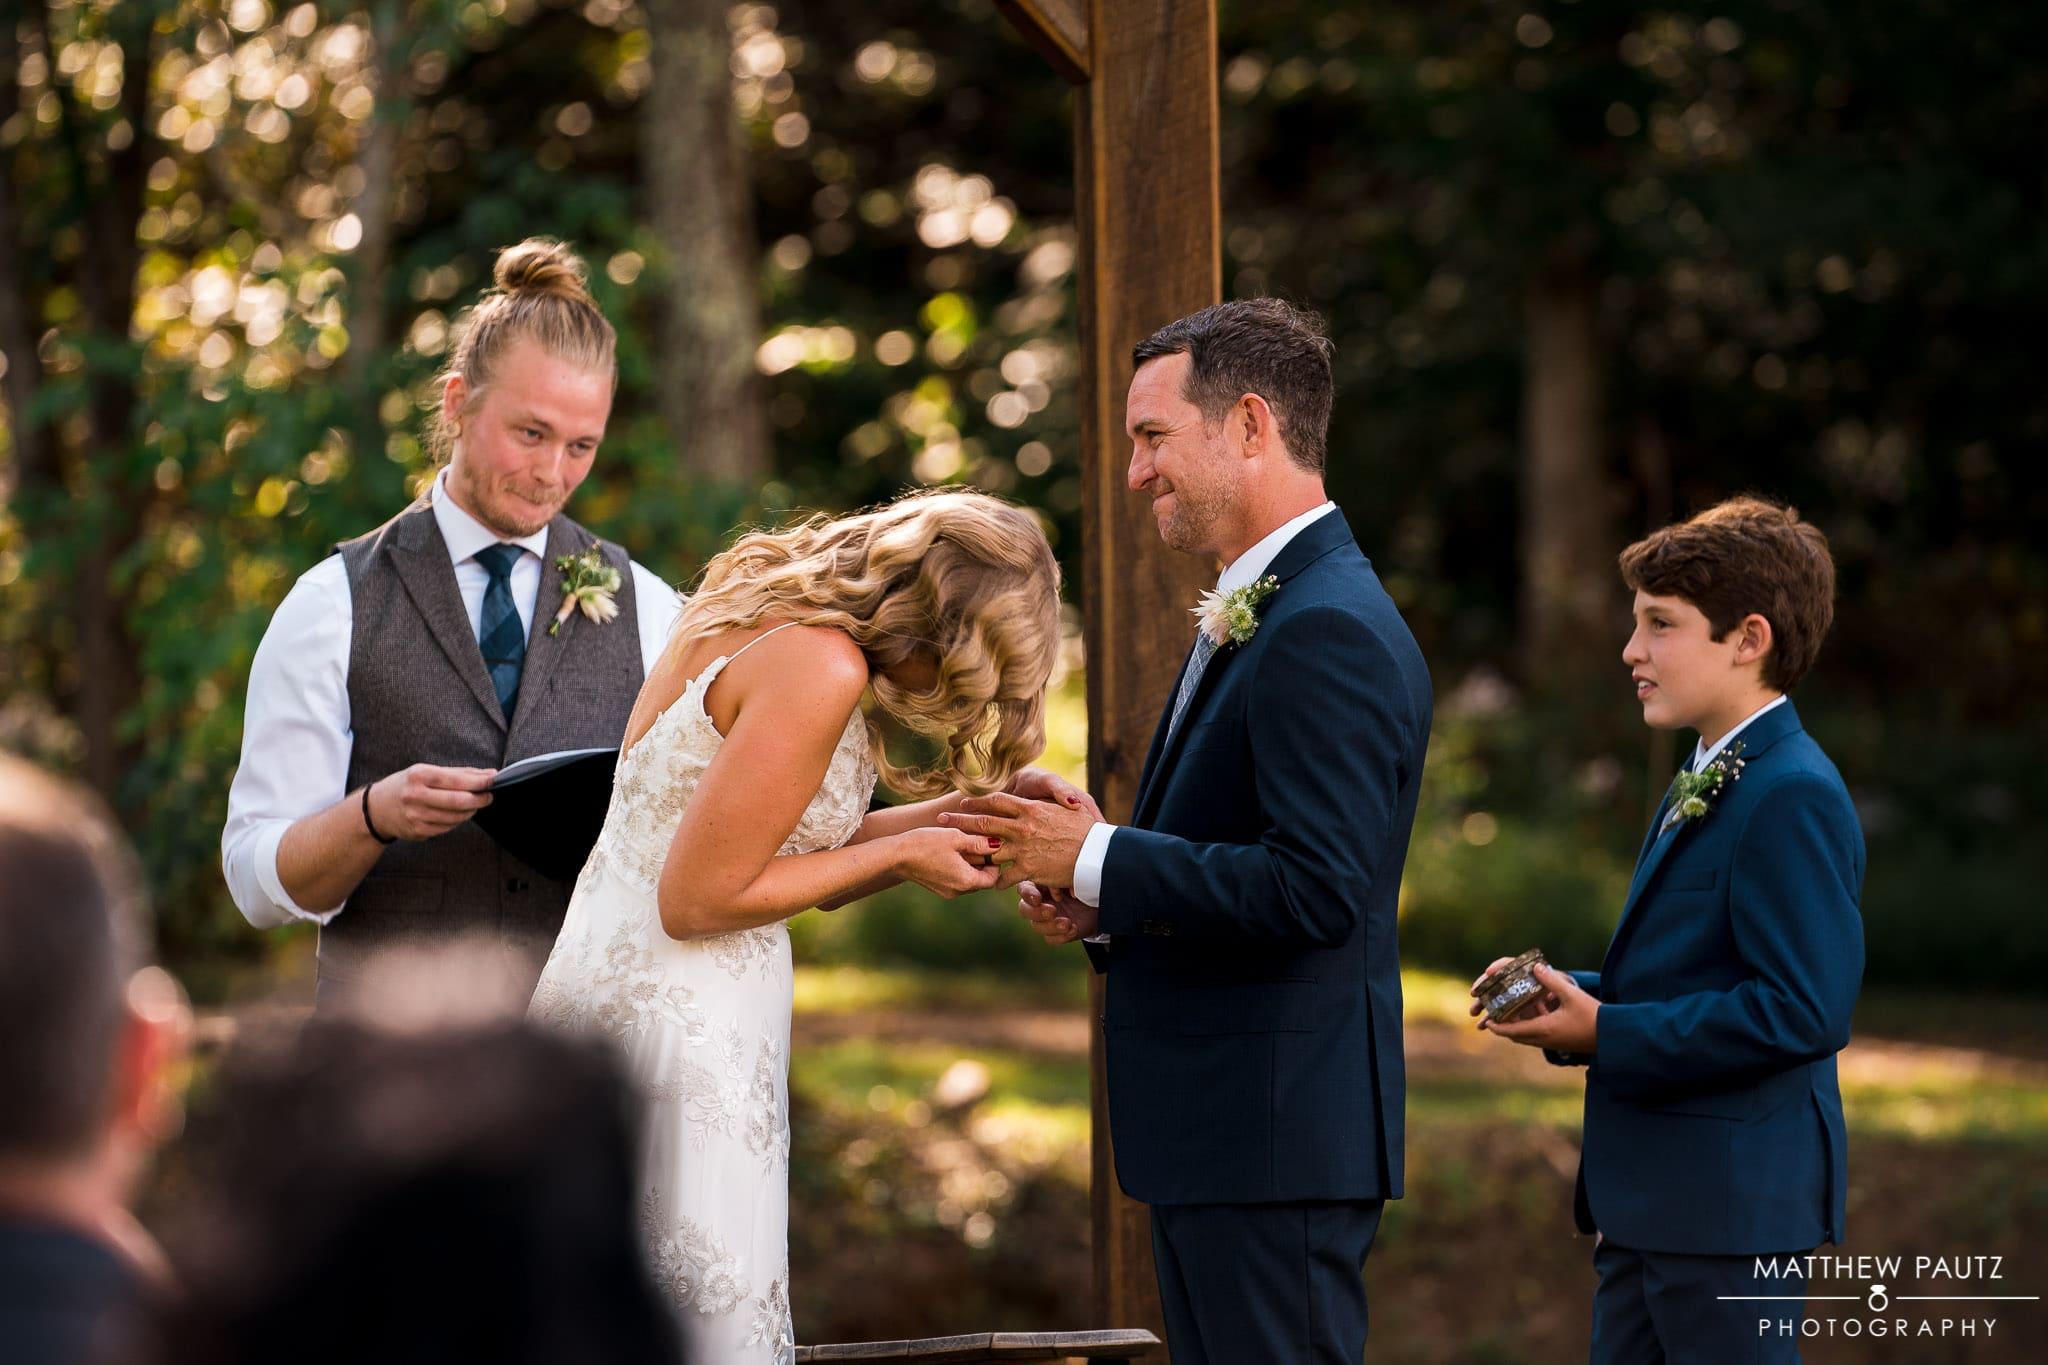 Junebug Retro wedding ceremony